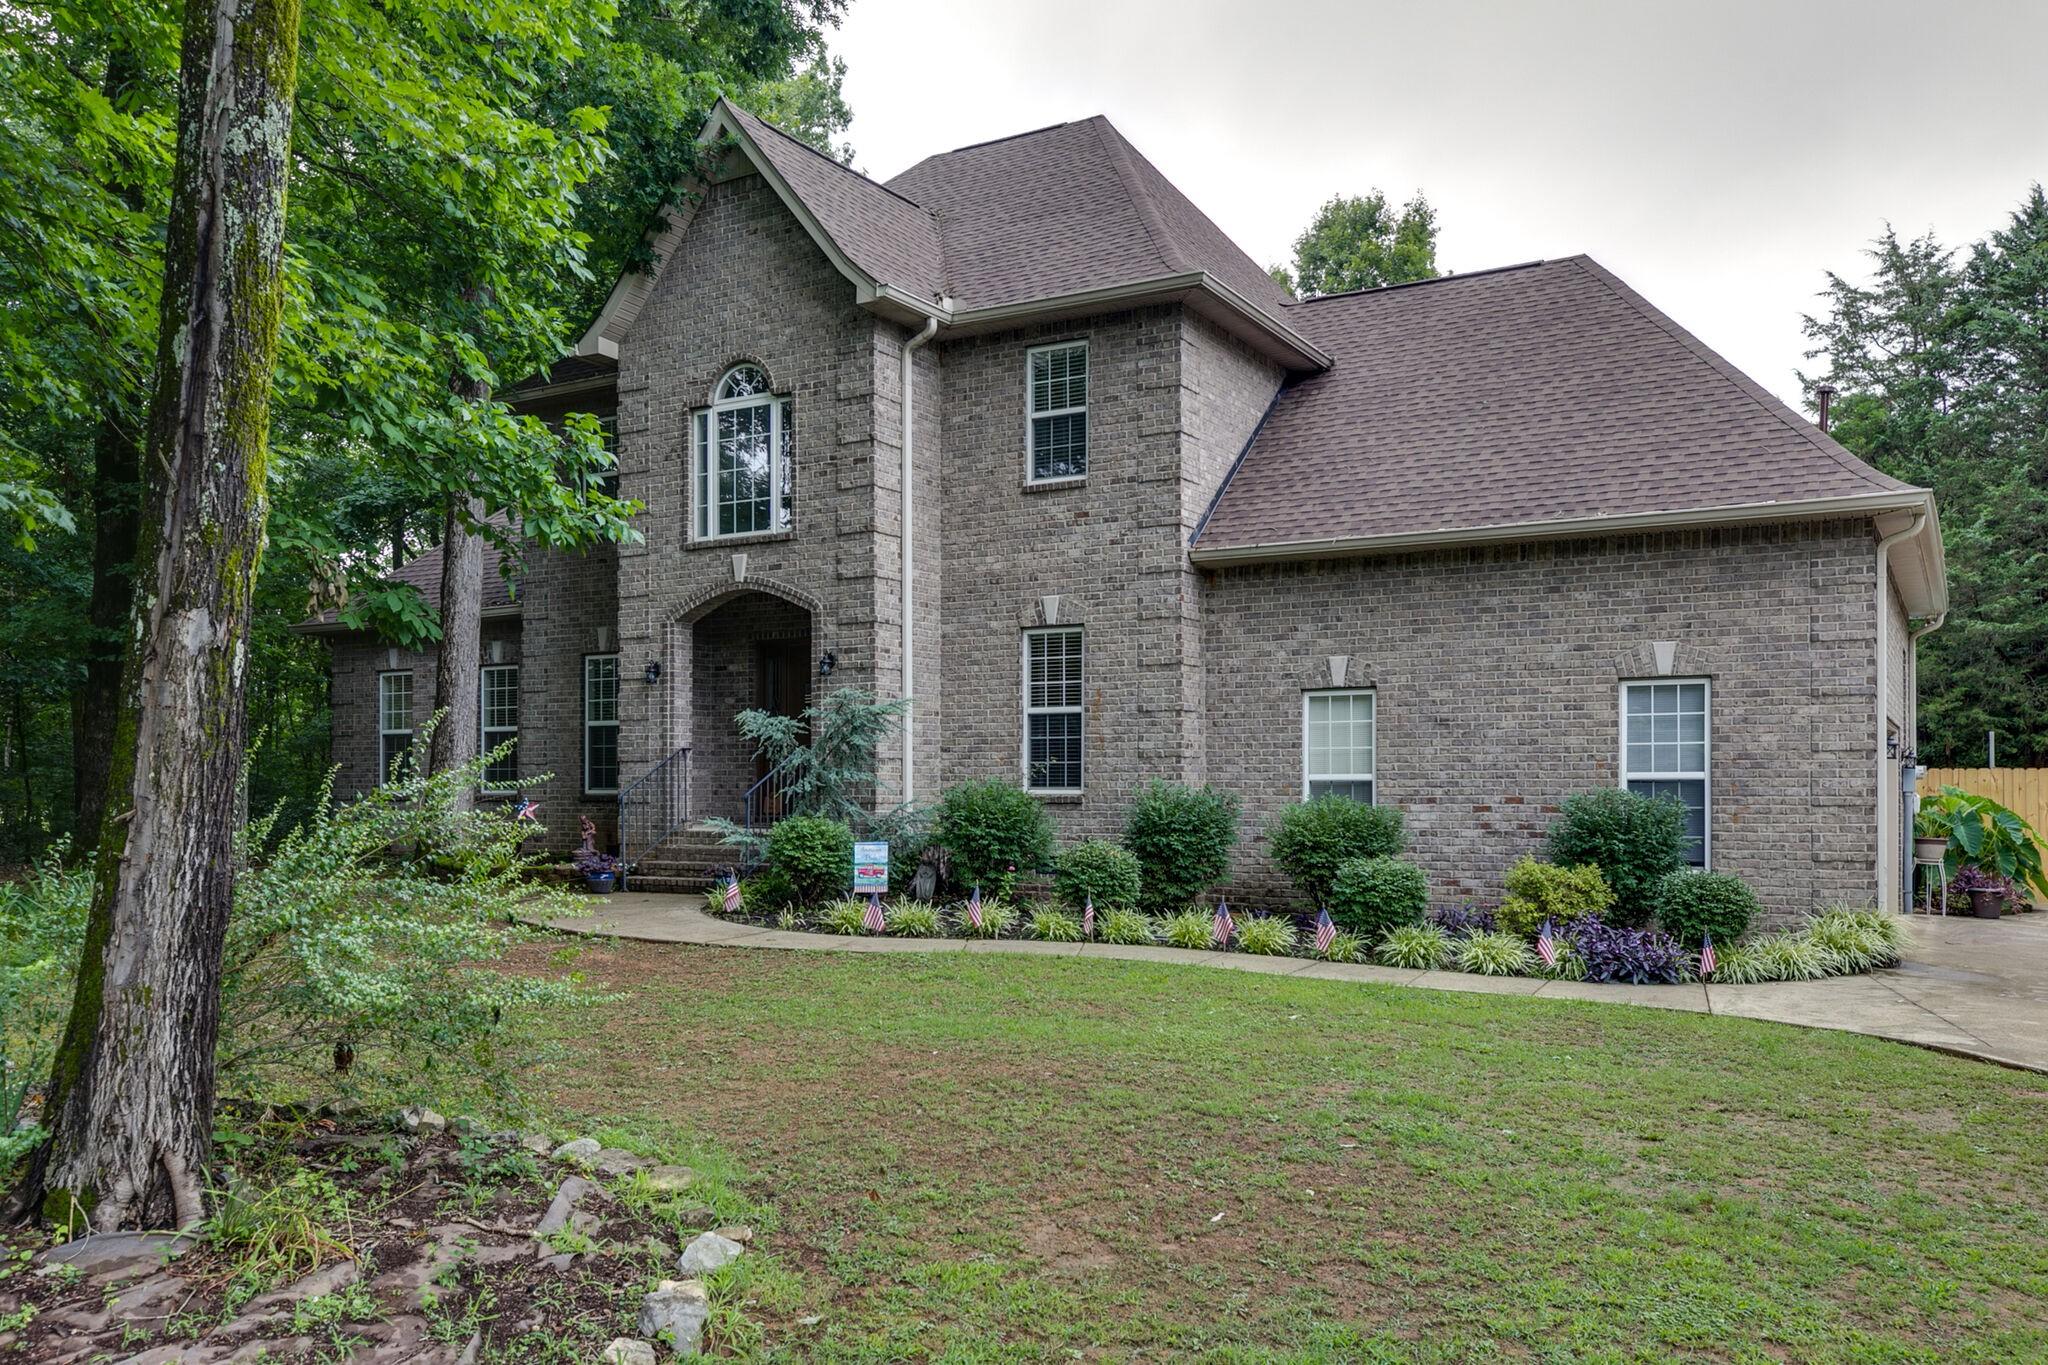 2011 Richard Garrett Property Photo - Christiana, TN real estate listing